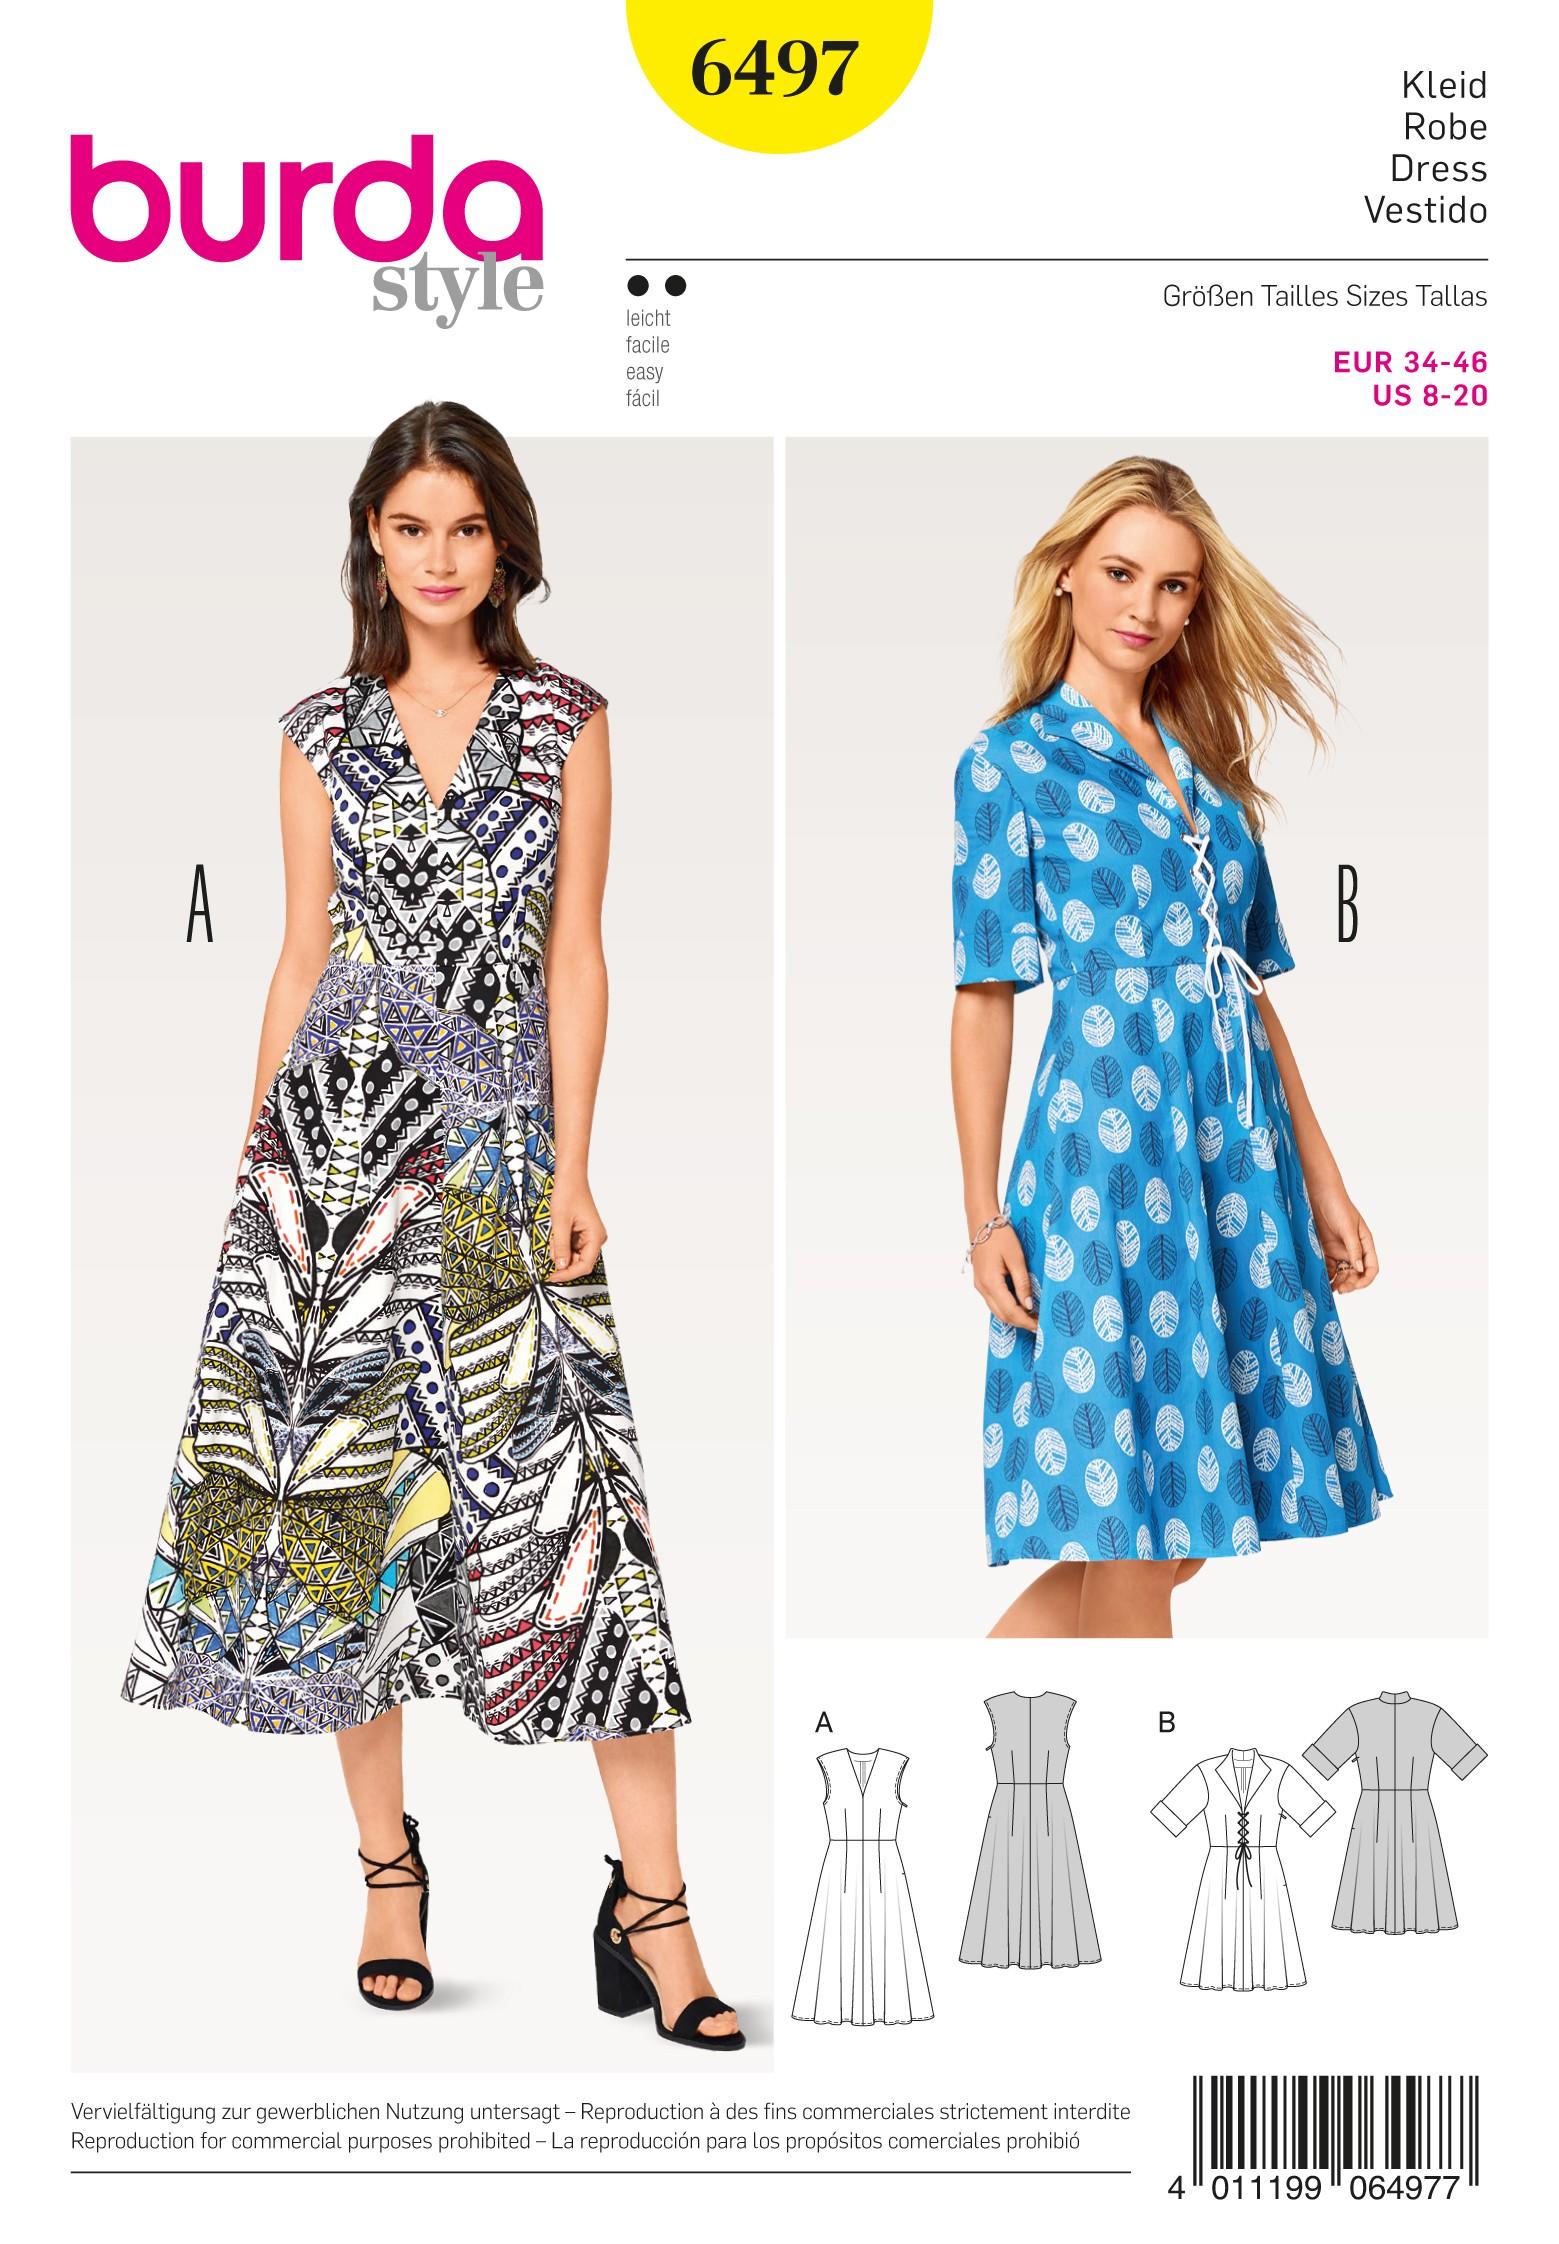 Burda Sewing Pattern 6496 Woman's Feminine High Waisted Dress